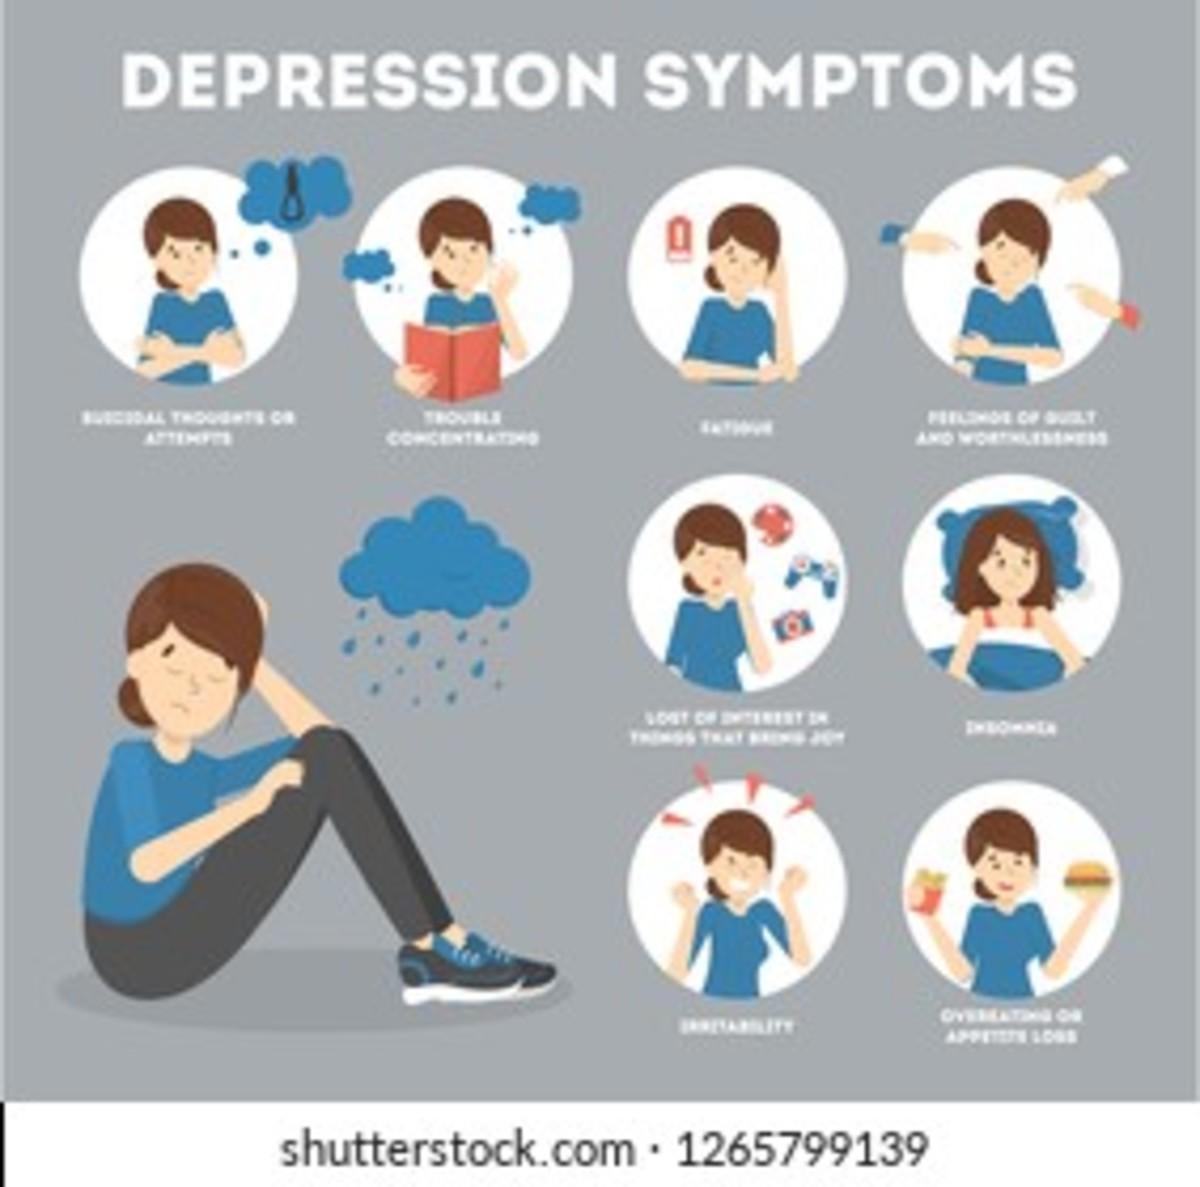 Symptoms: Depression